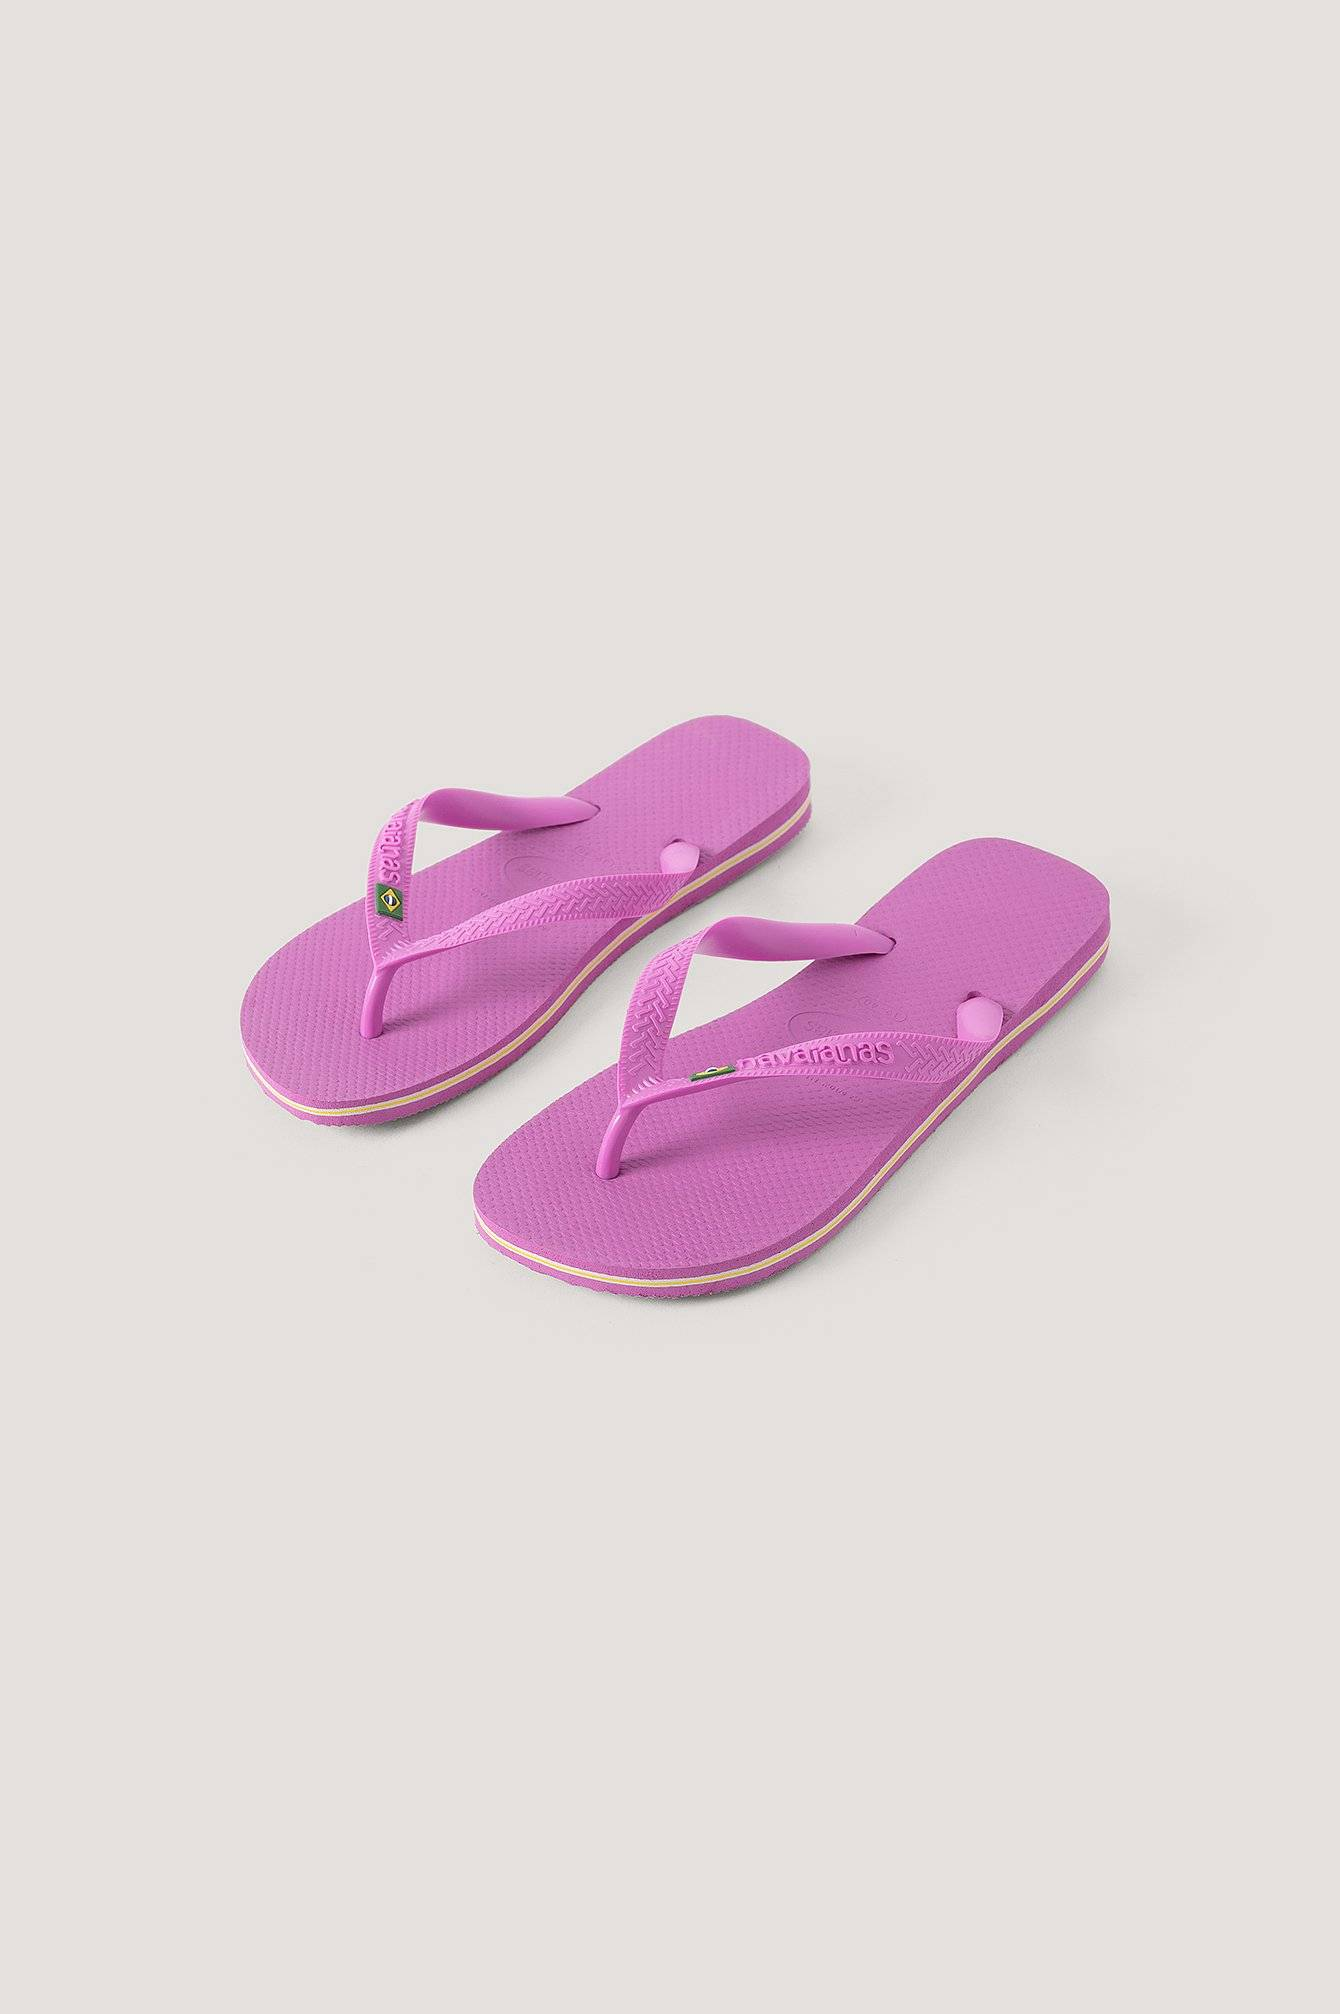 Havaianas Brazil Flip Flop - Pink